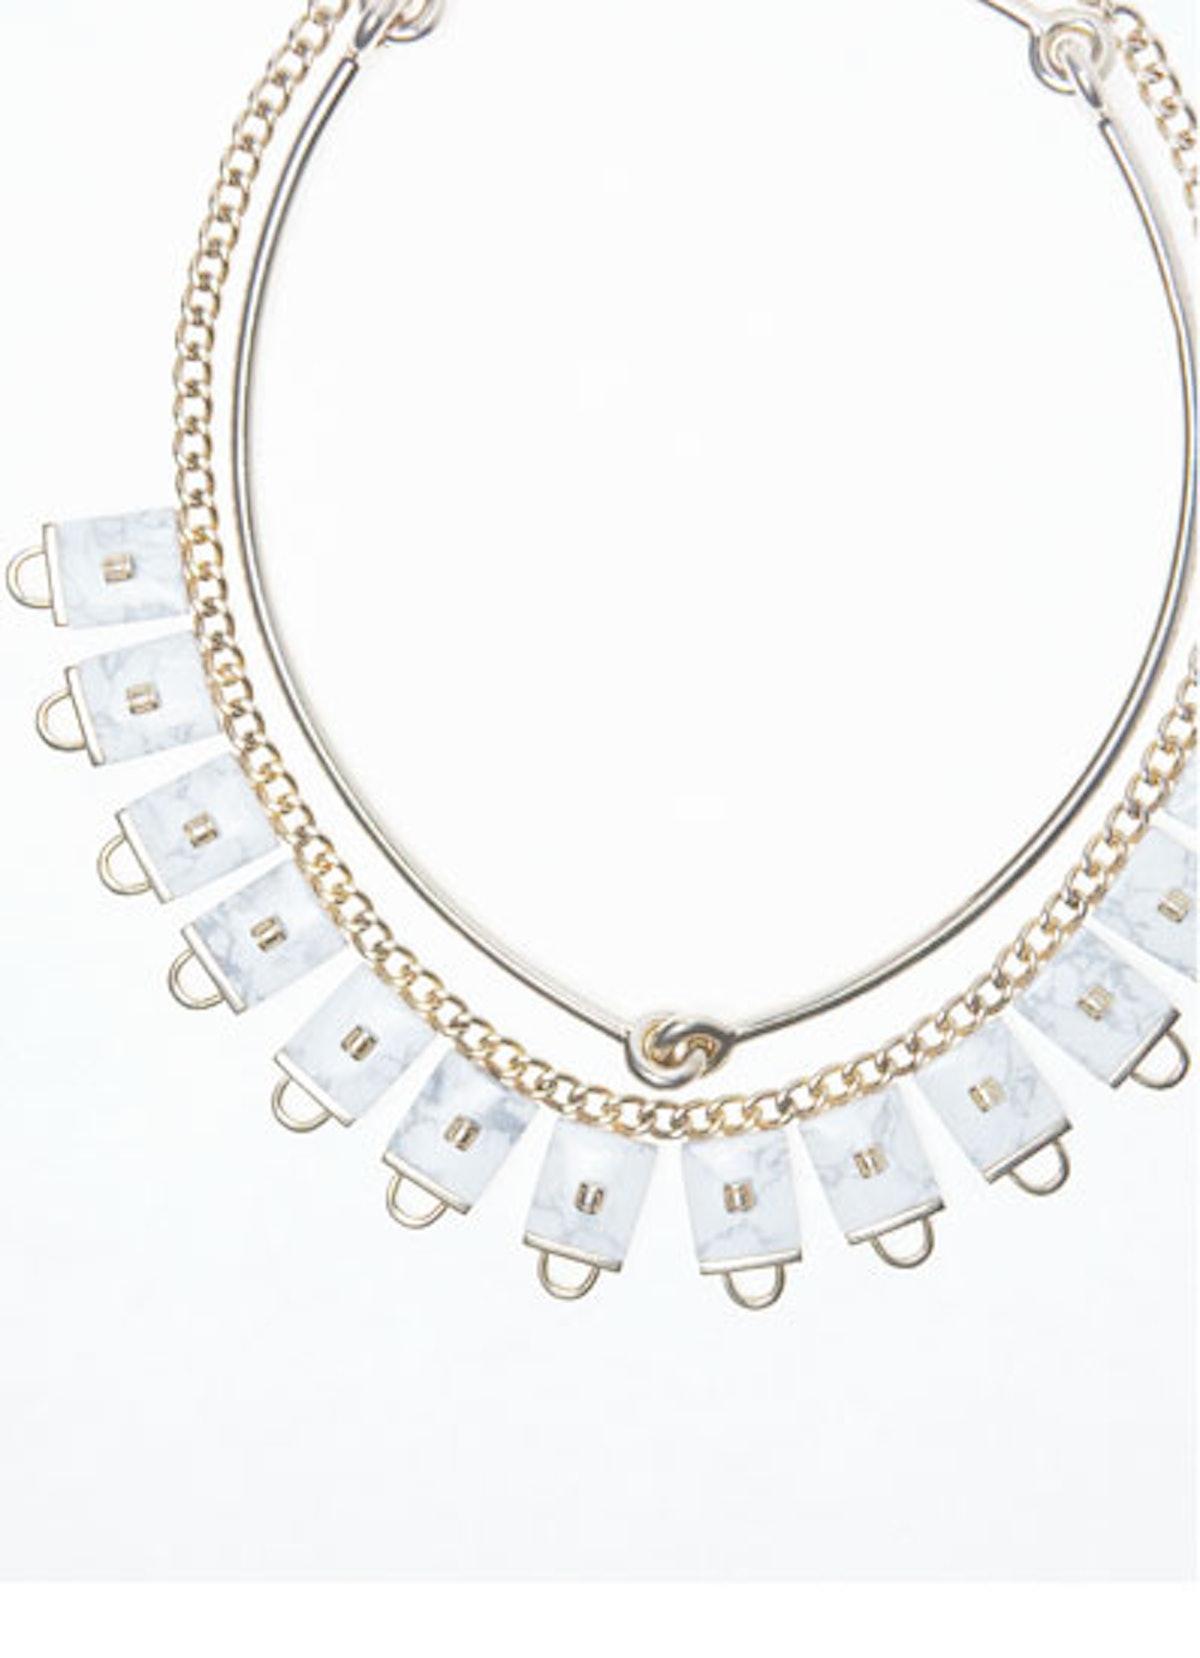 acss_gold_jewelry_01_v.jpg